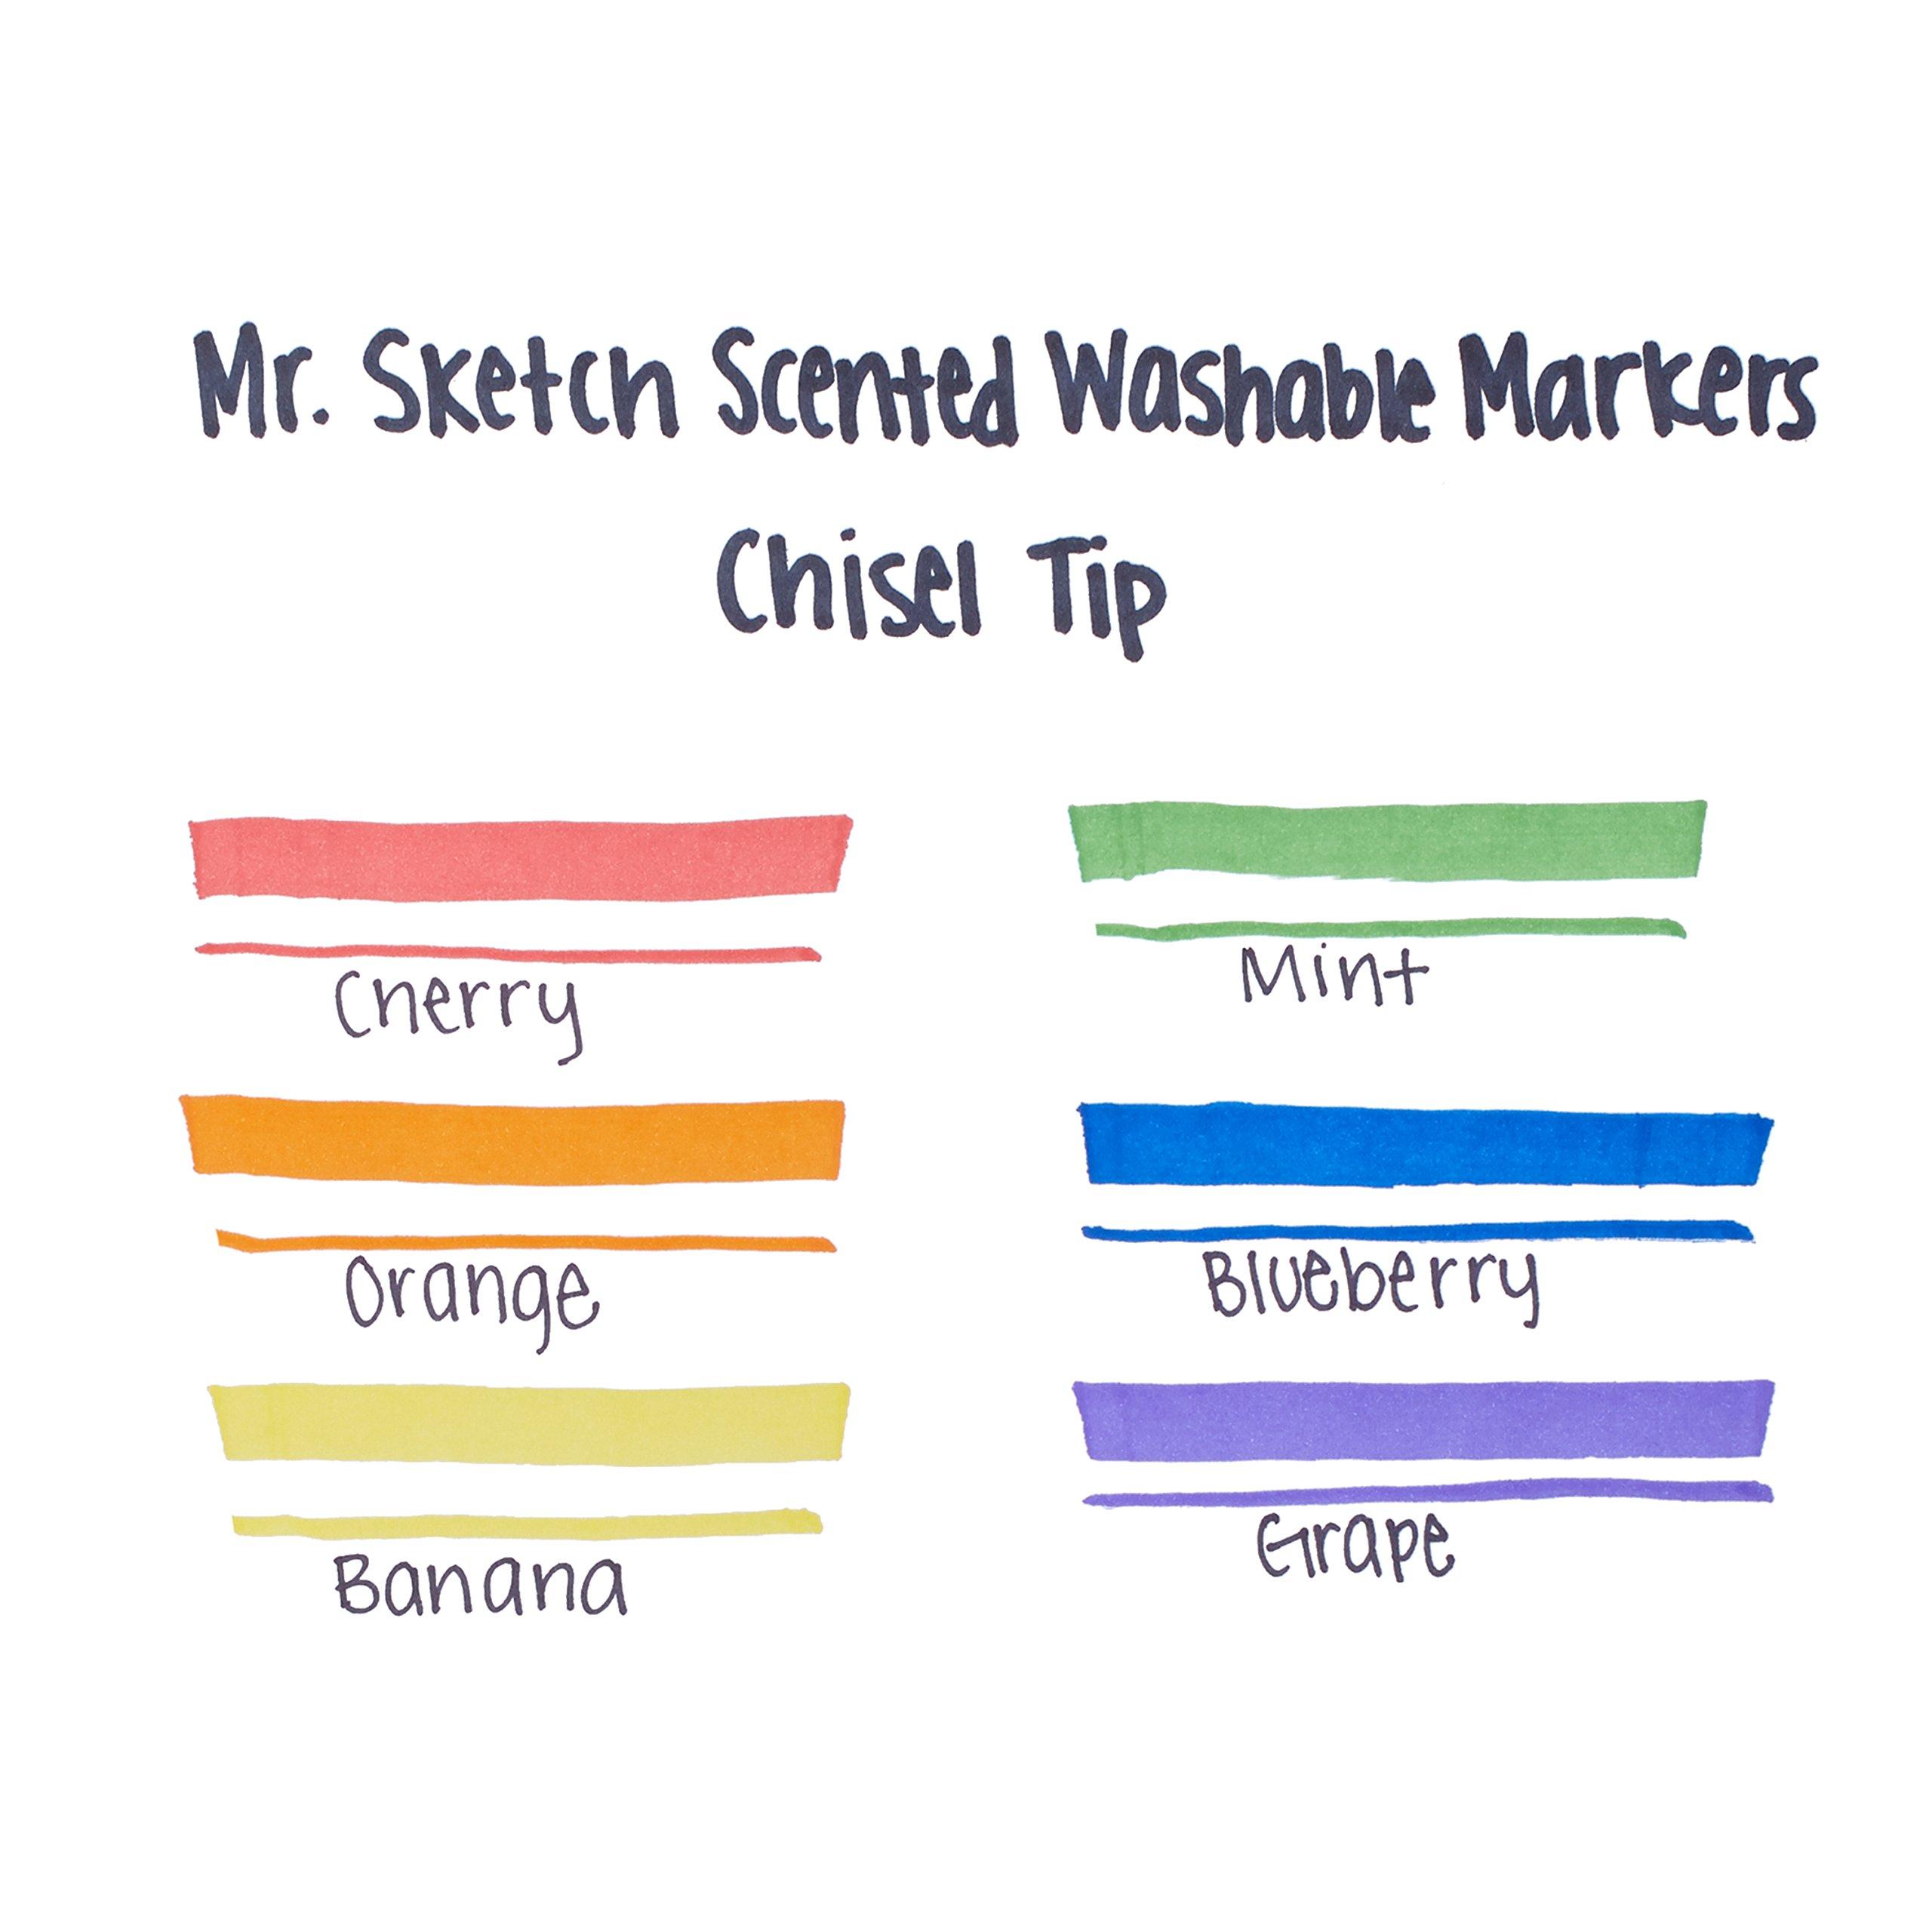 Mr. Sketch Scented Washable Markers, Chisel-Tip, Set of 6 by Mr. Sketch (Image #3)